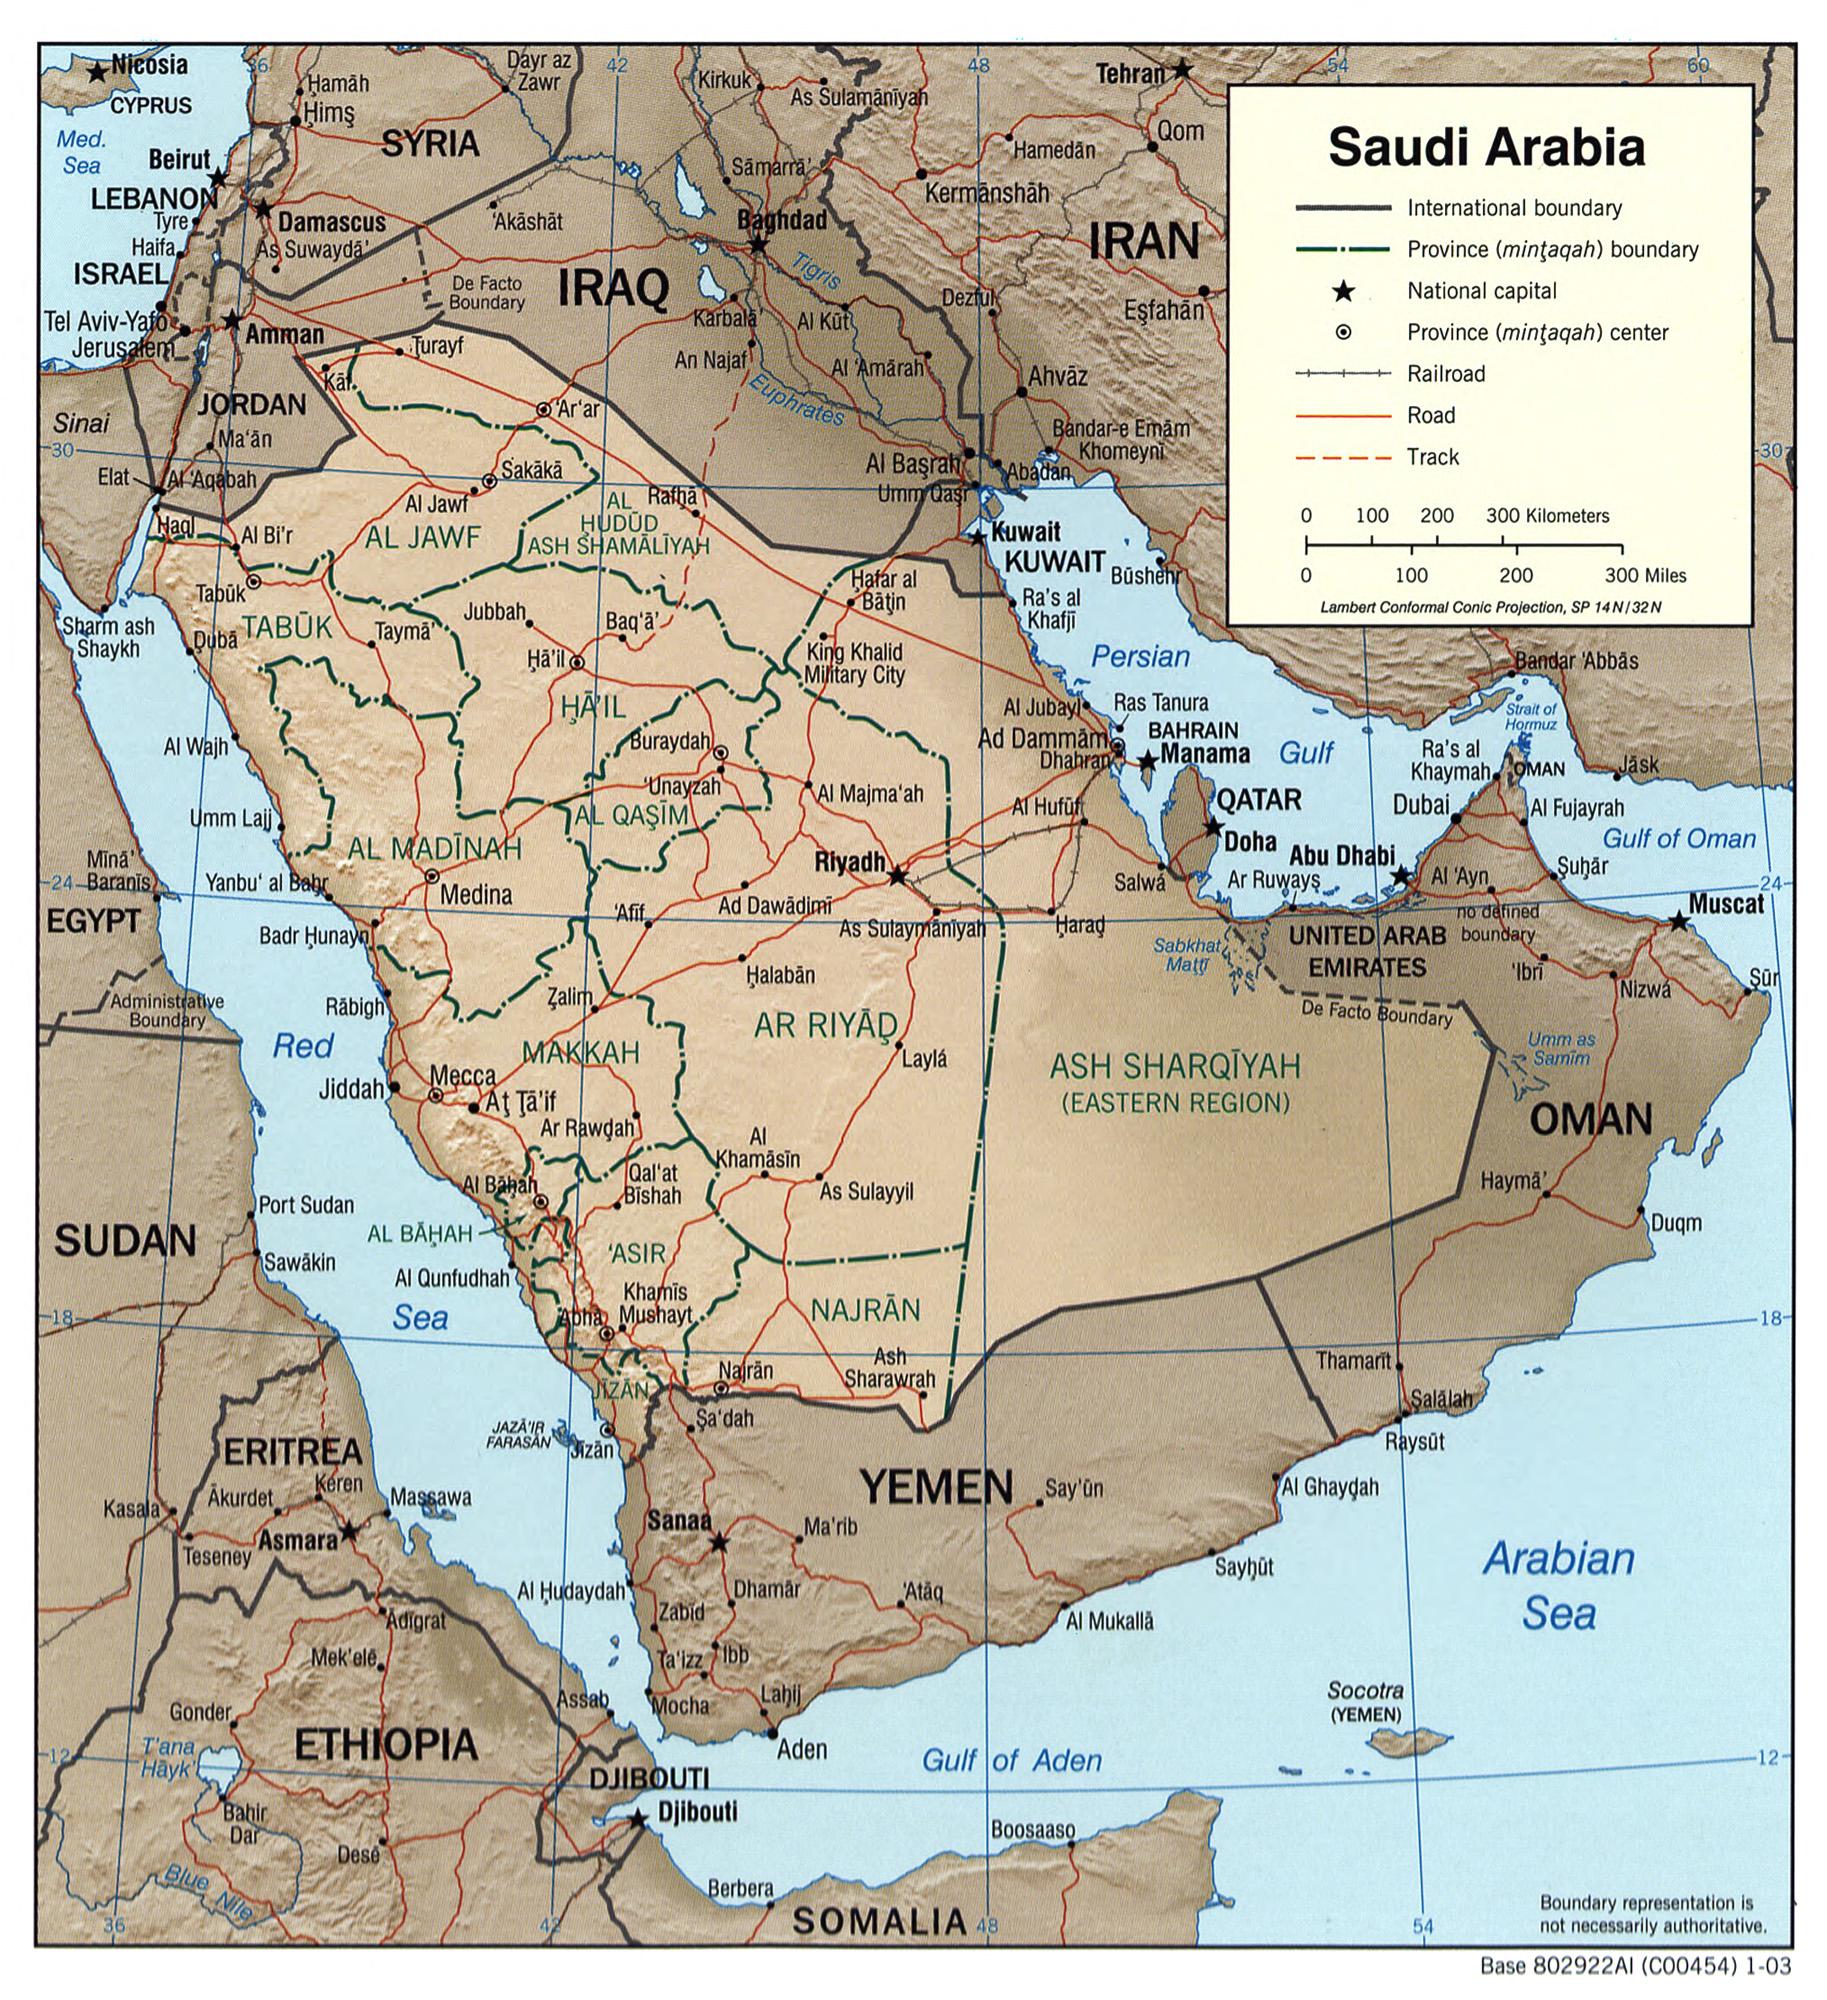 Saudi Arabia 2003 CIA map